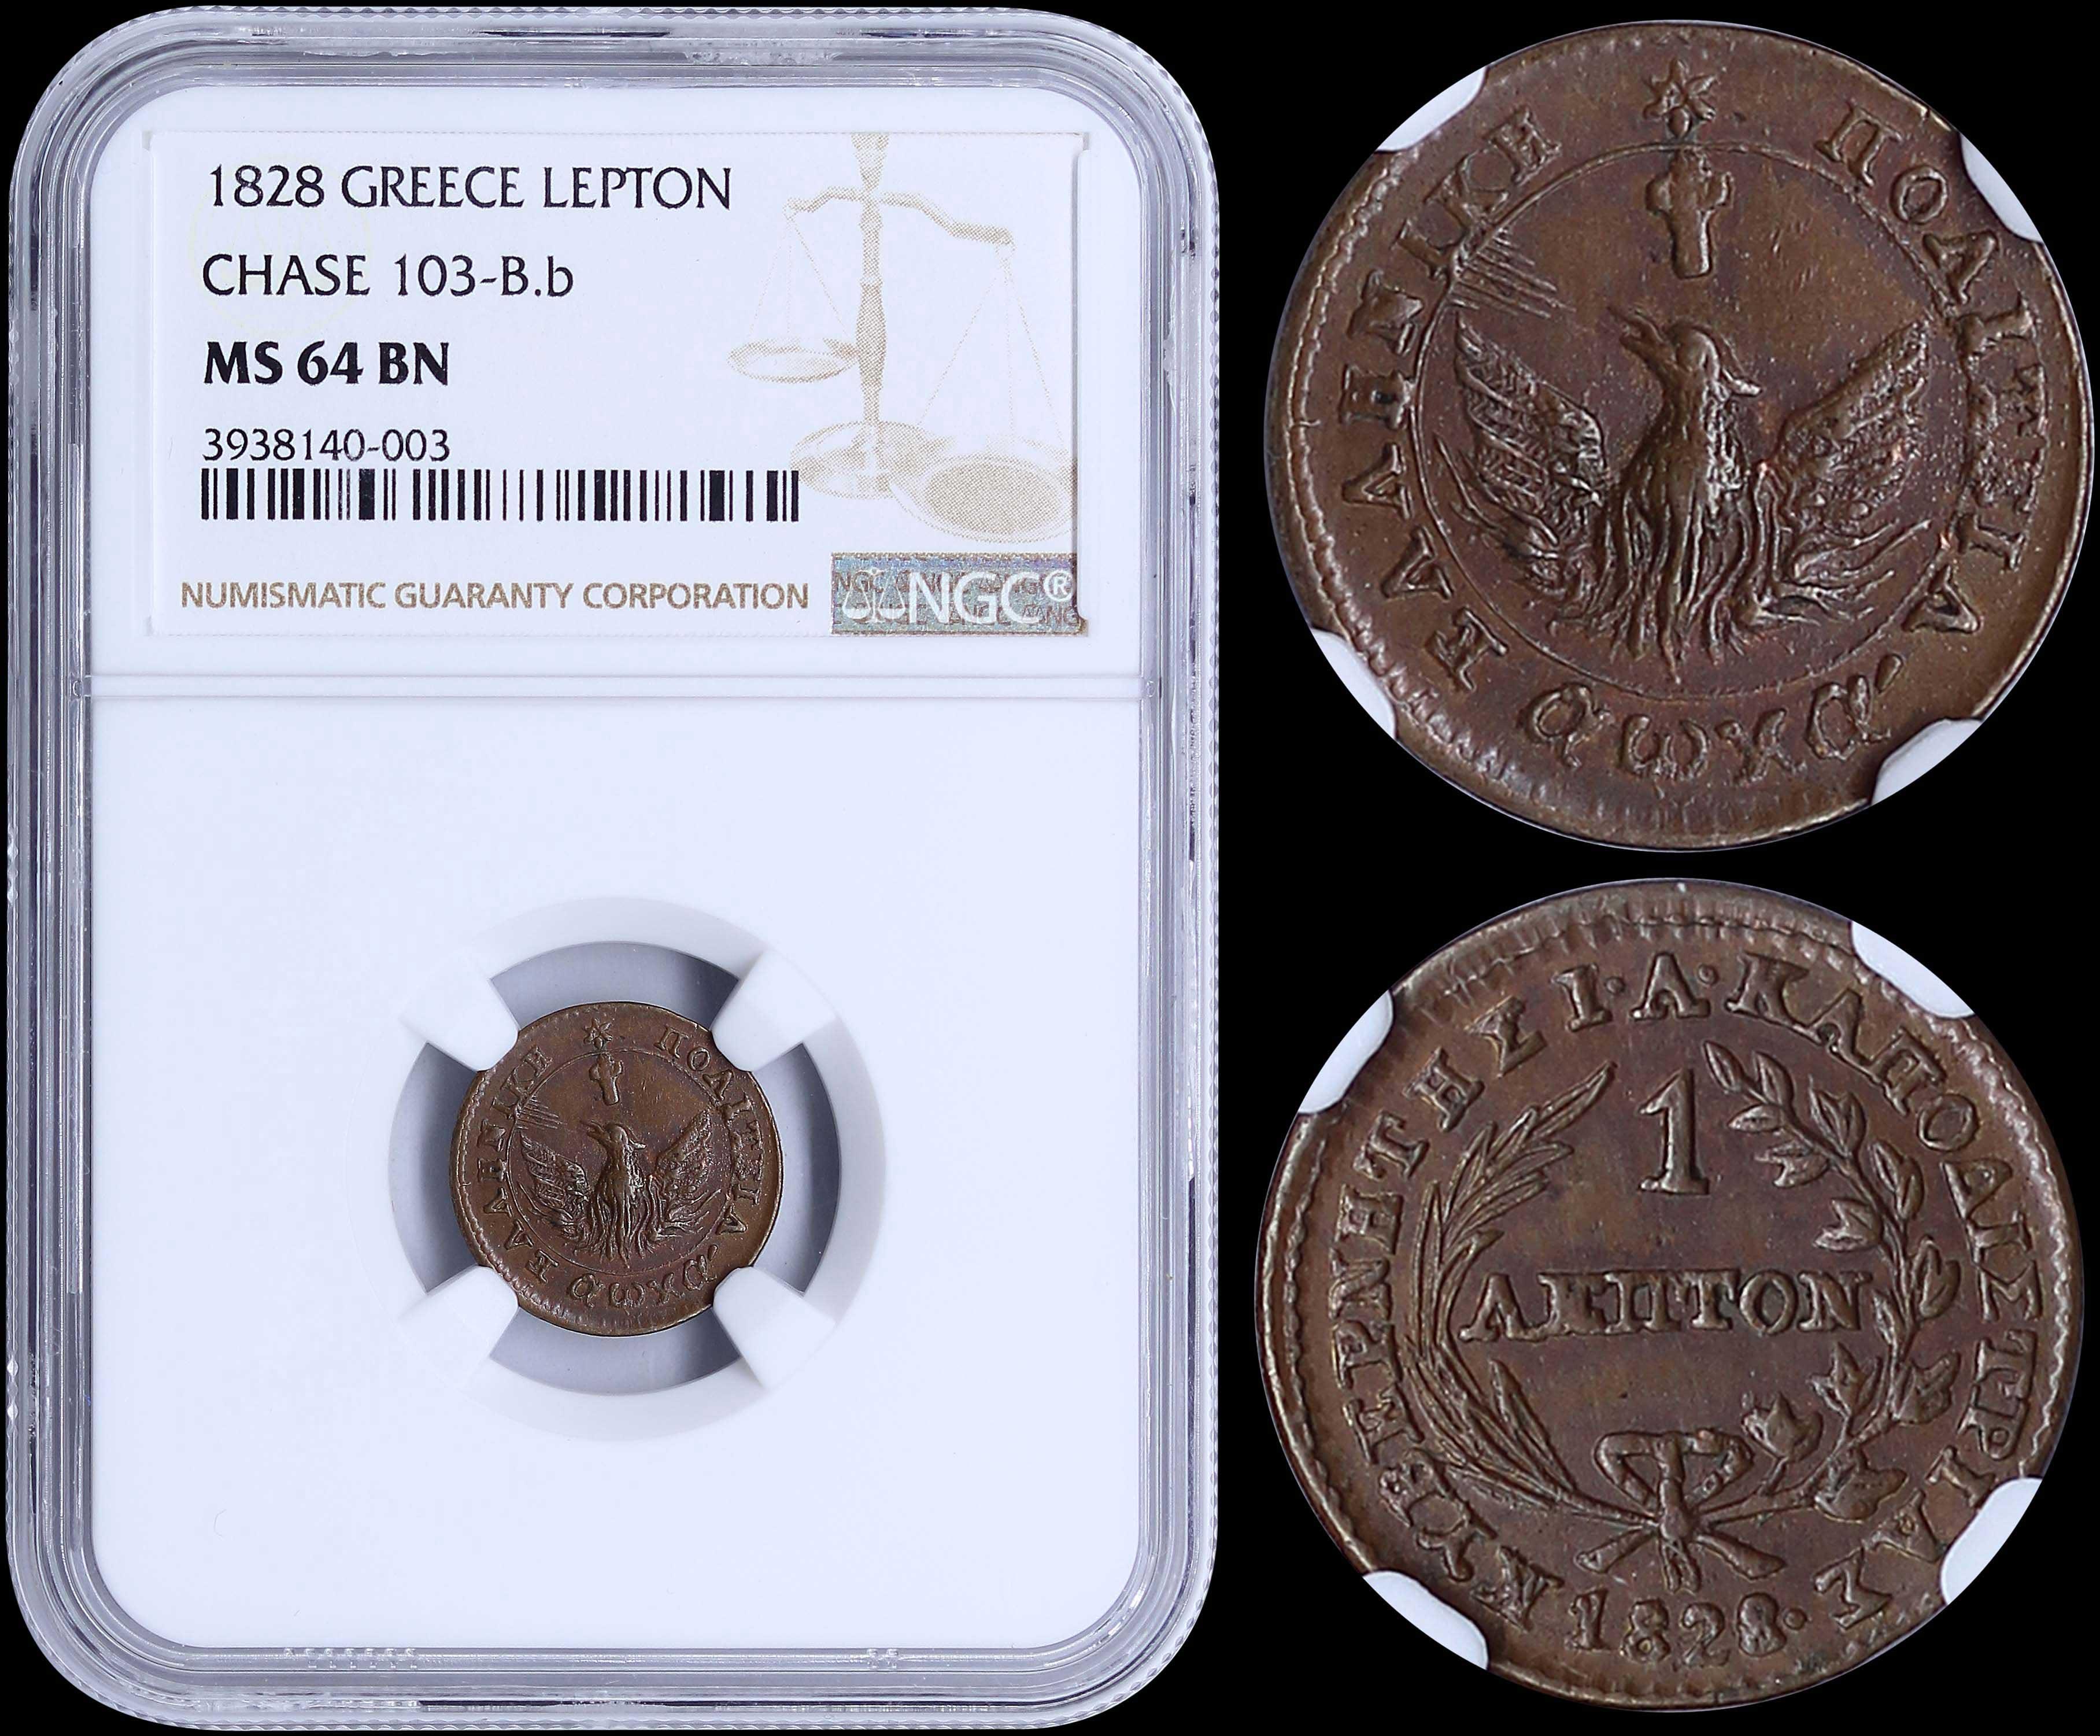 Lot 8002 - -  COINS & TOKENS governor capodistrias -  A. Karamitsos Public & Live Bid Auction 644 Coins, Medals & Banknotes